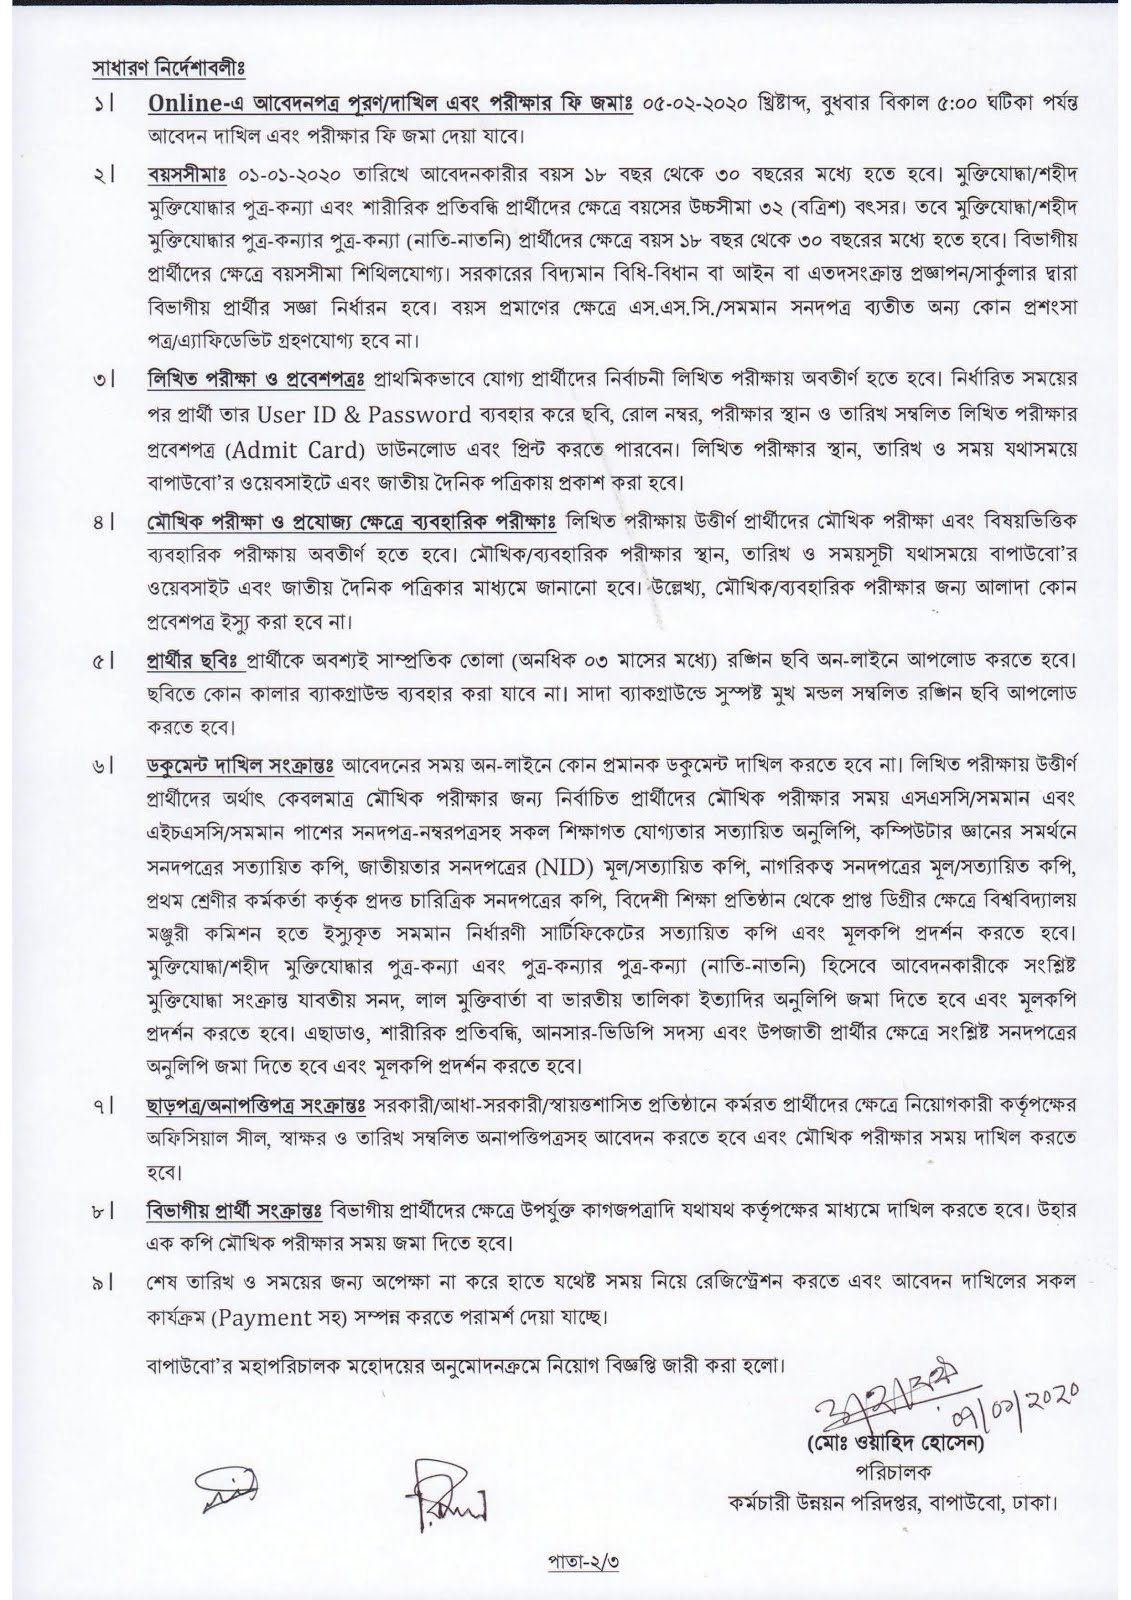 Bangladesh Water Development Board BWDB Job Circular 2020